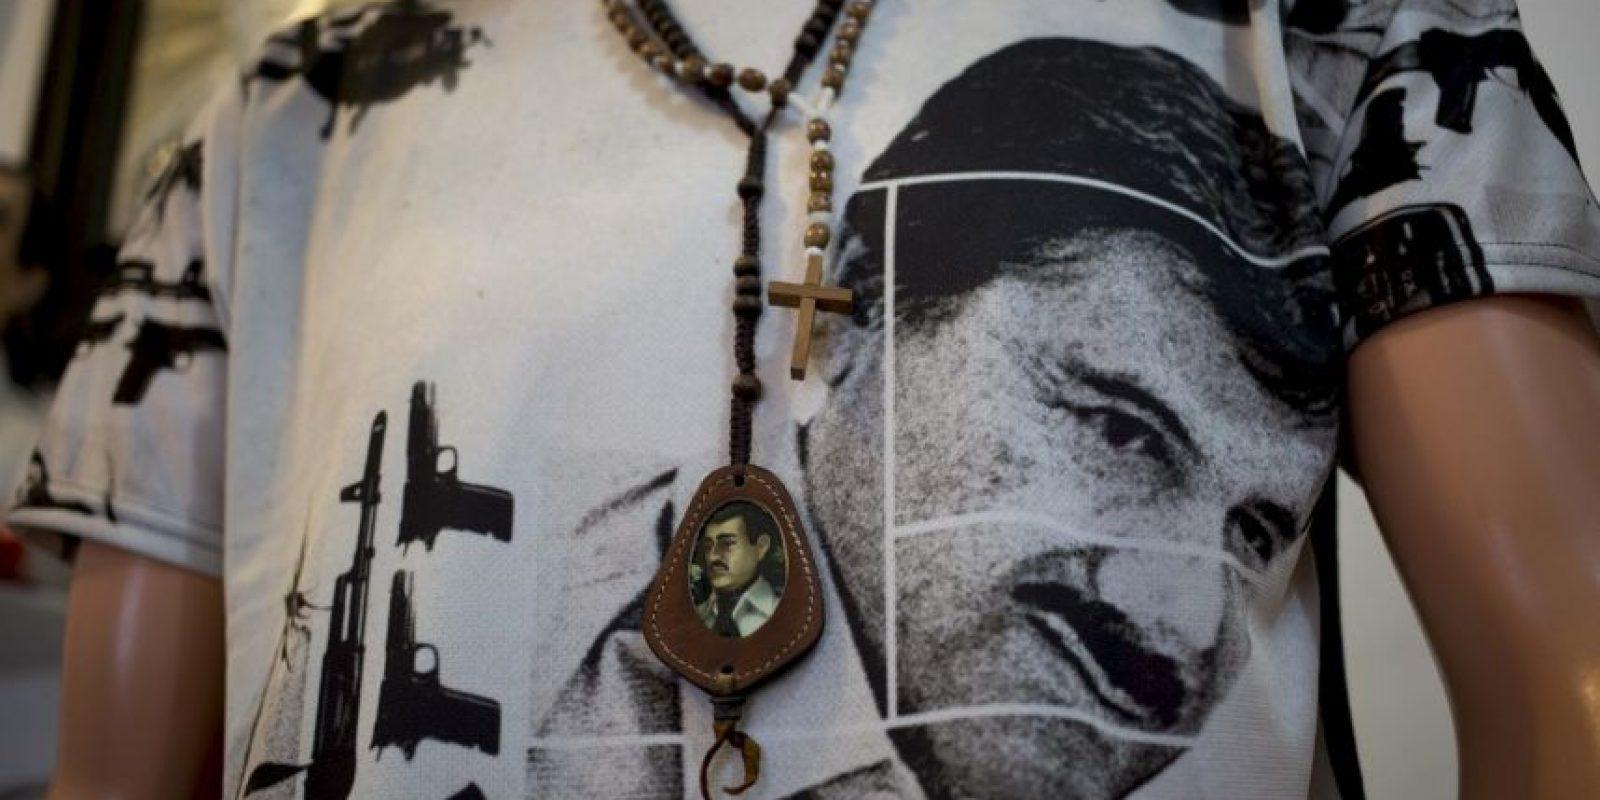 Del penal de alta seguridad del Altiplano, en México. Foto:AP